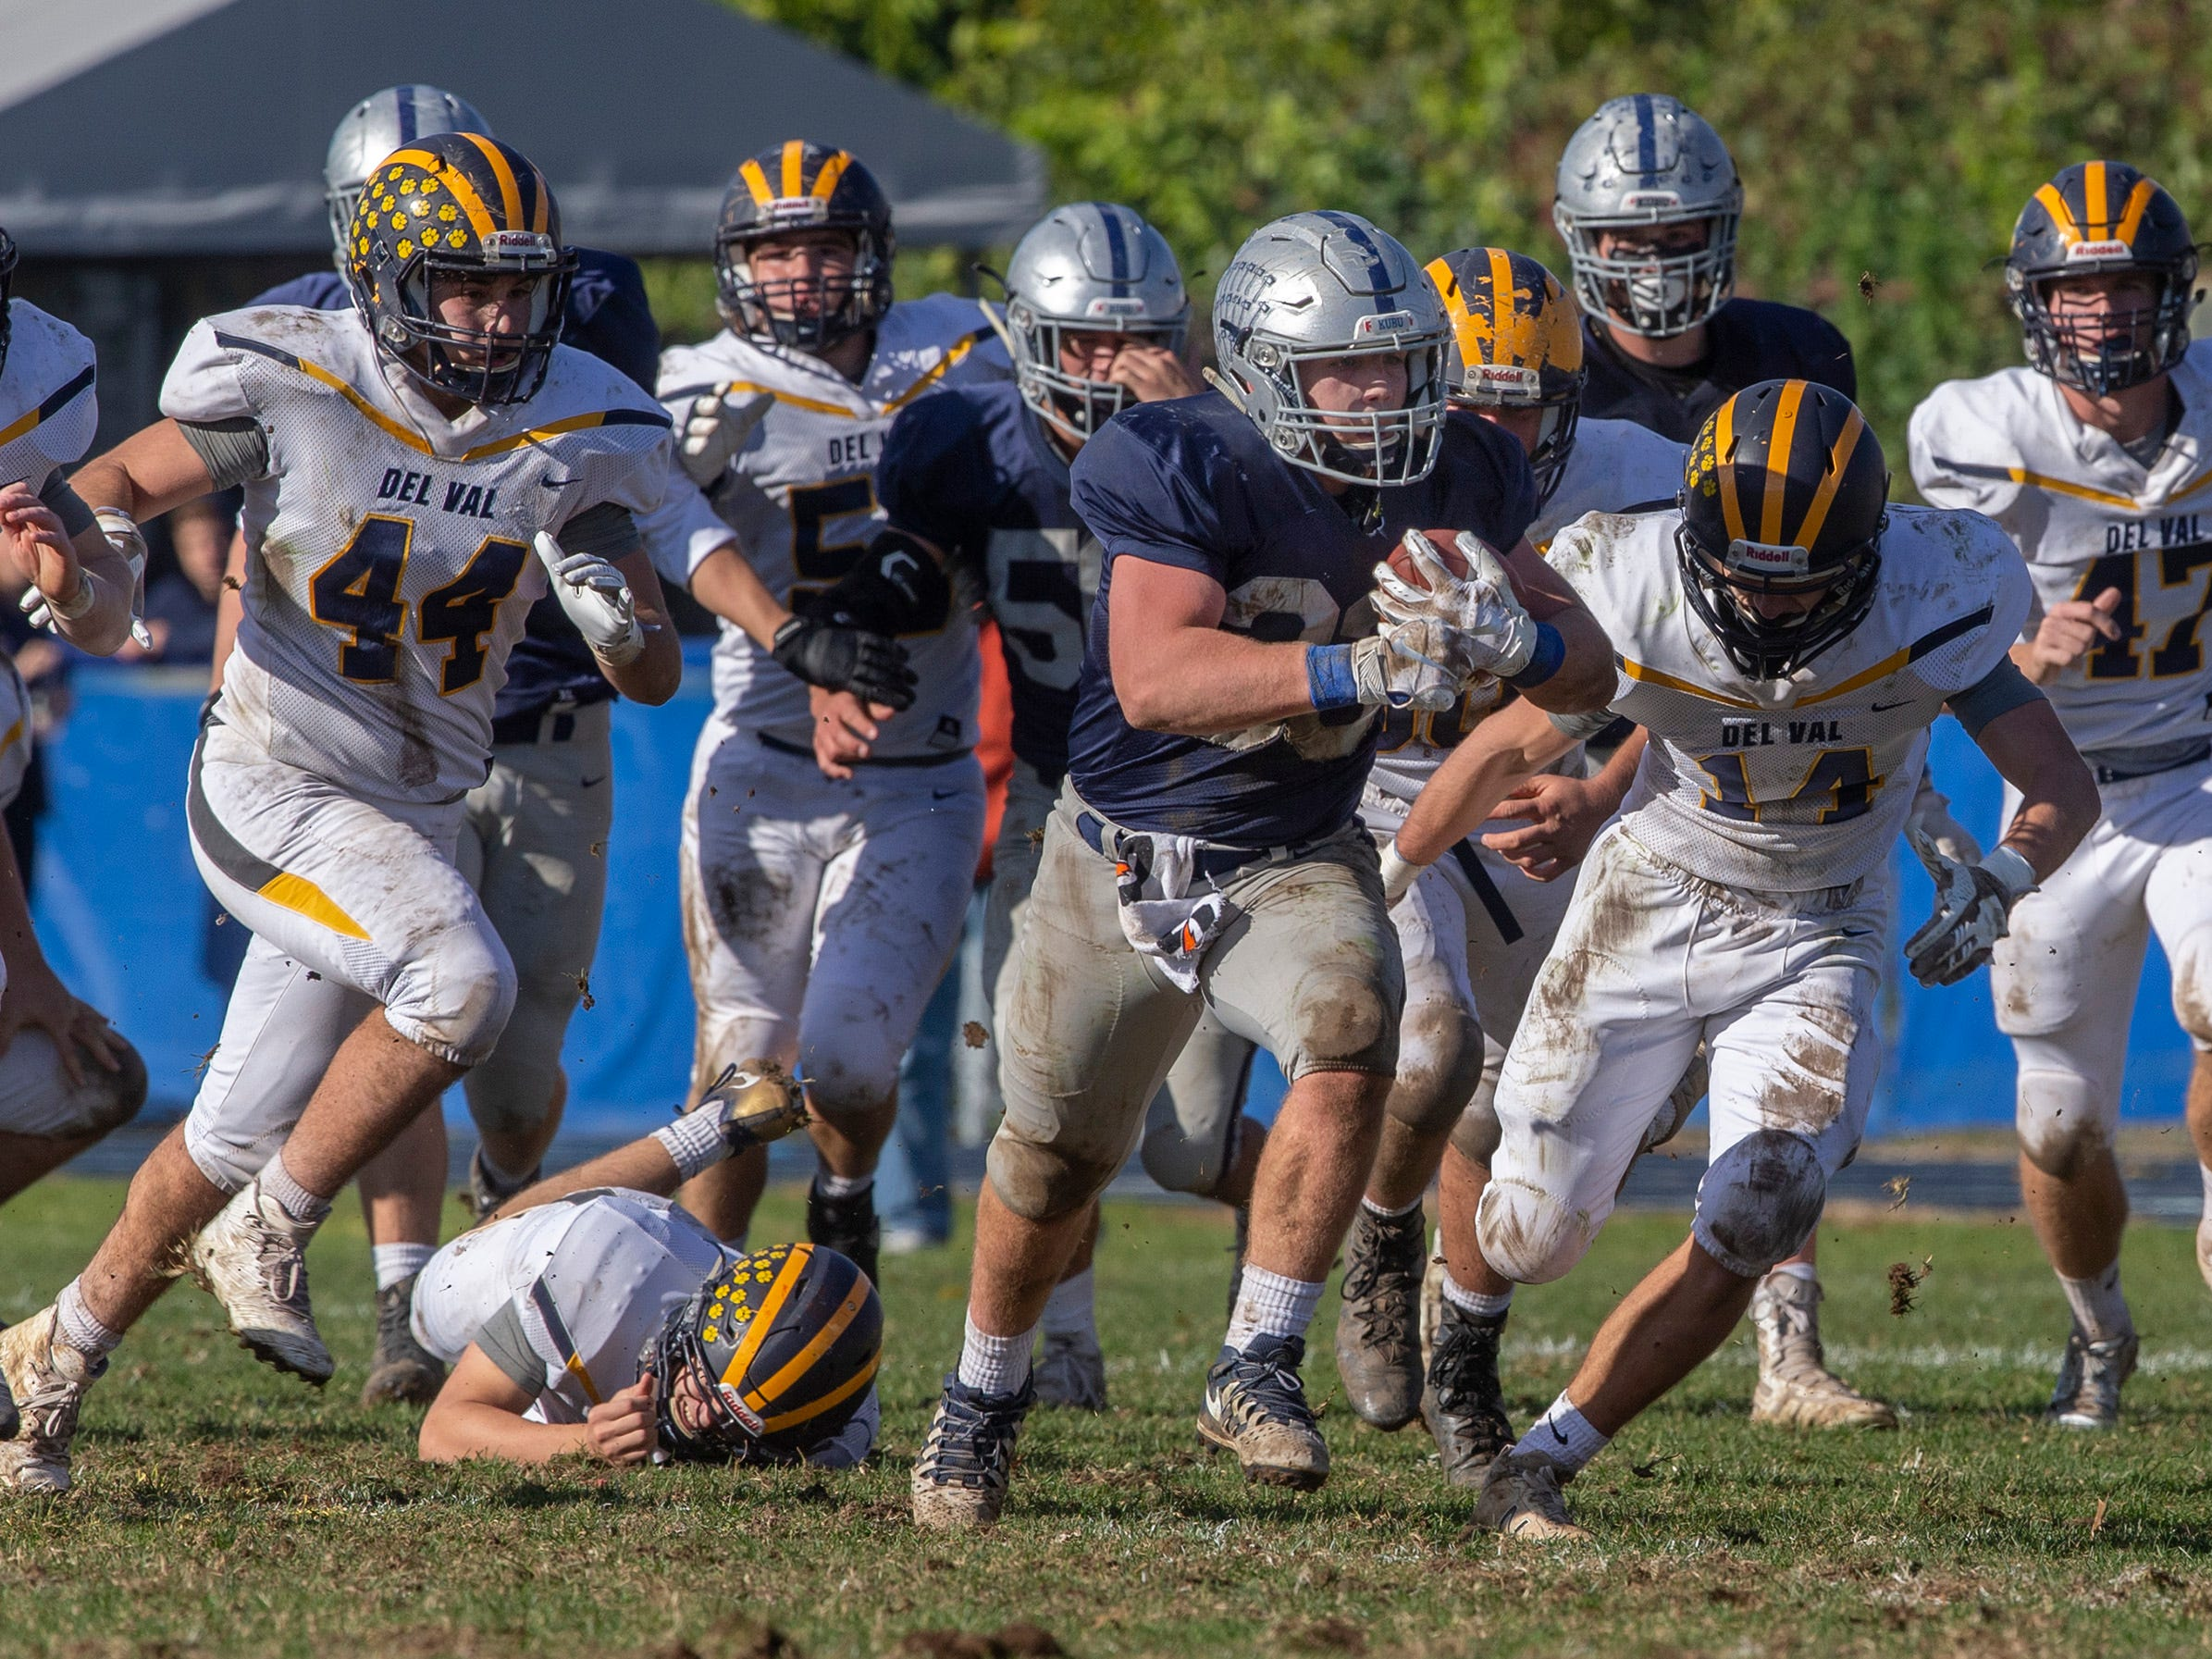 Manasquan Football buries Delaware Valley in NJSIAA opening round game in Manasquan NJ. On November 3, 2018.